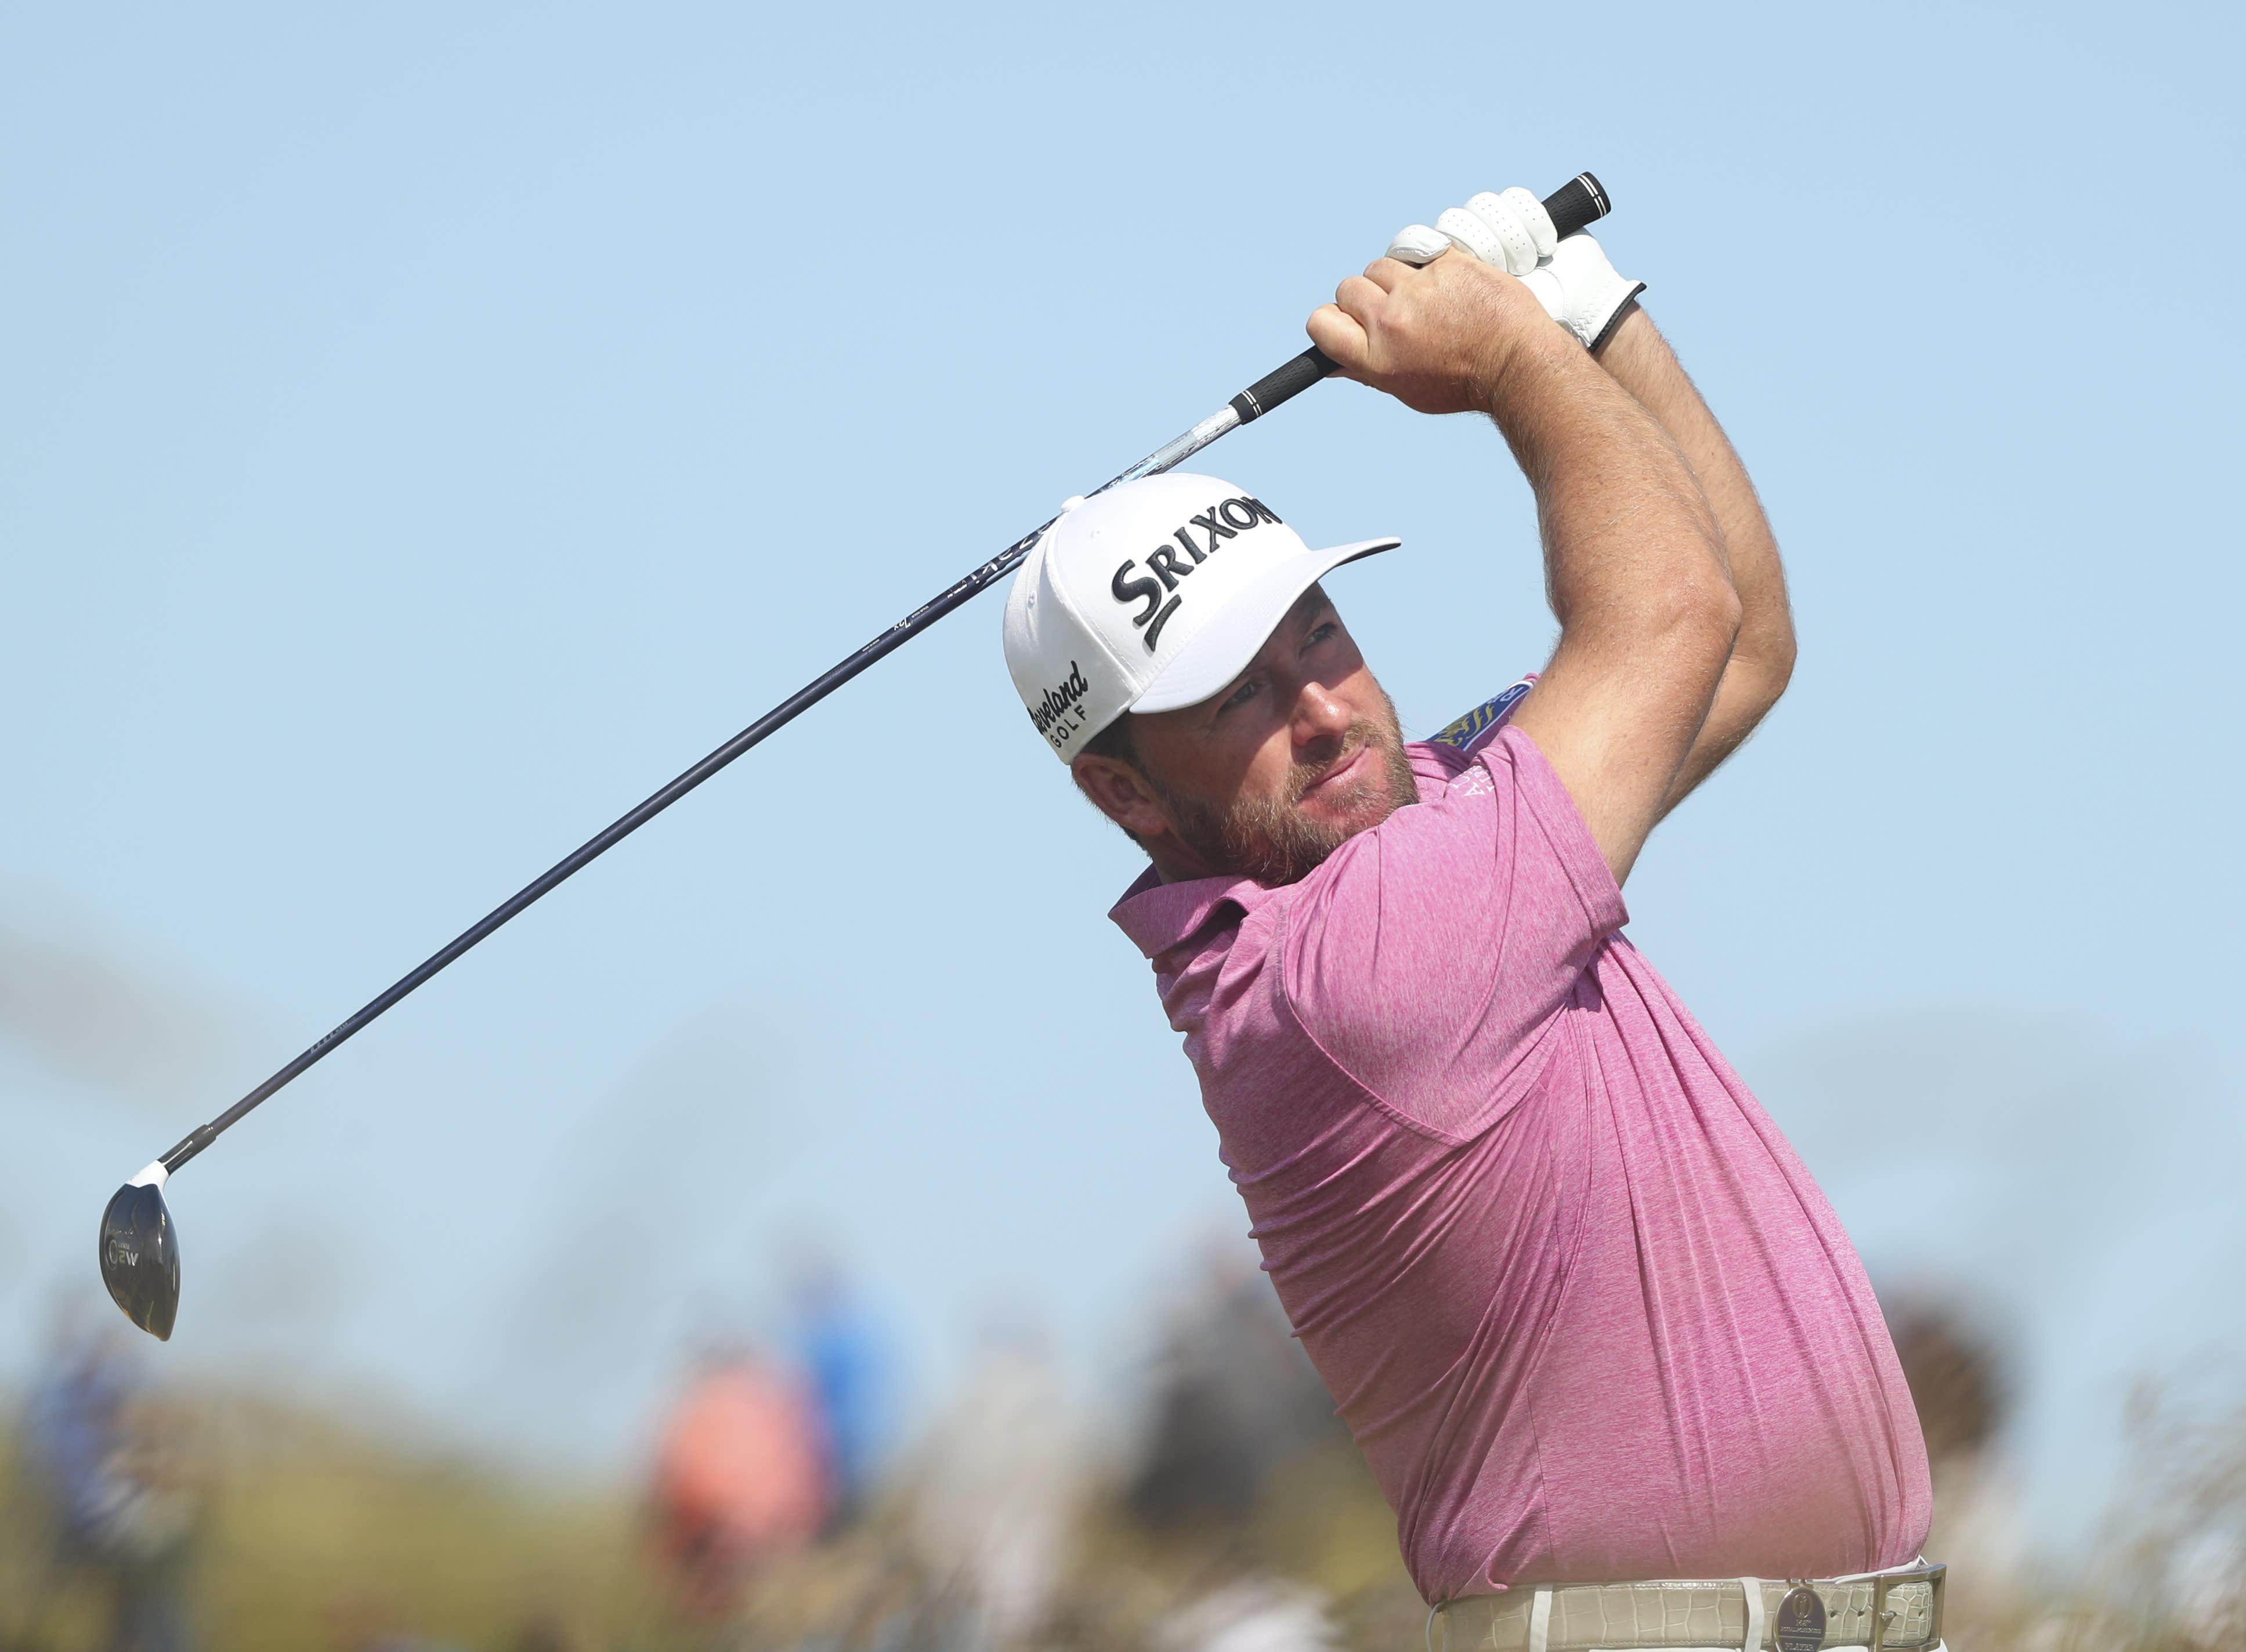 How golf star Graeme McDowell has battled back from career adversity